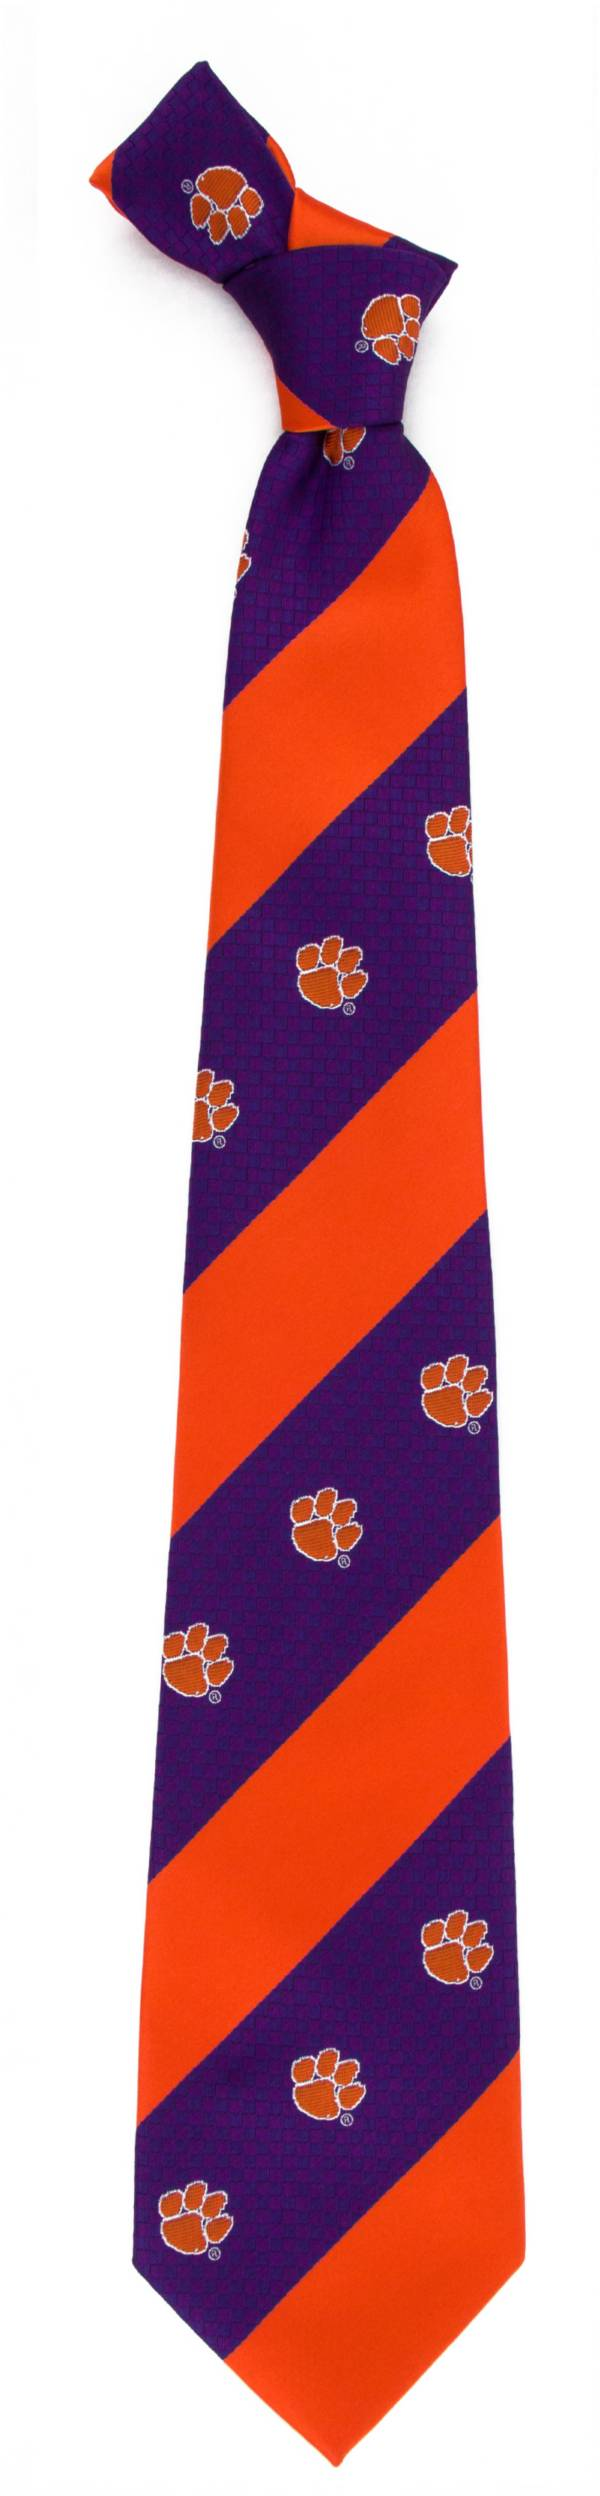 Eagles Wings Clemson Tigers Geo Stripe Necktie product image